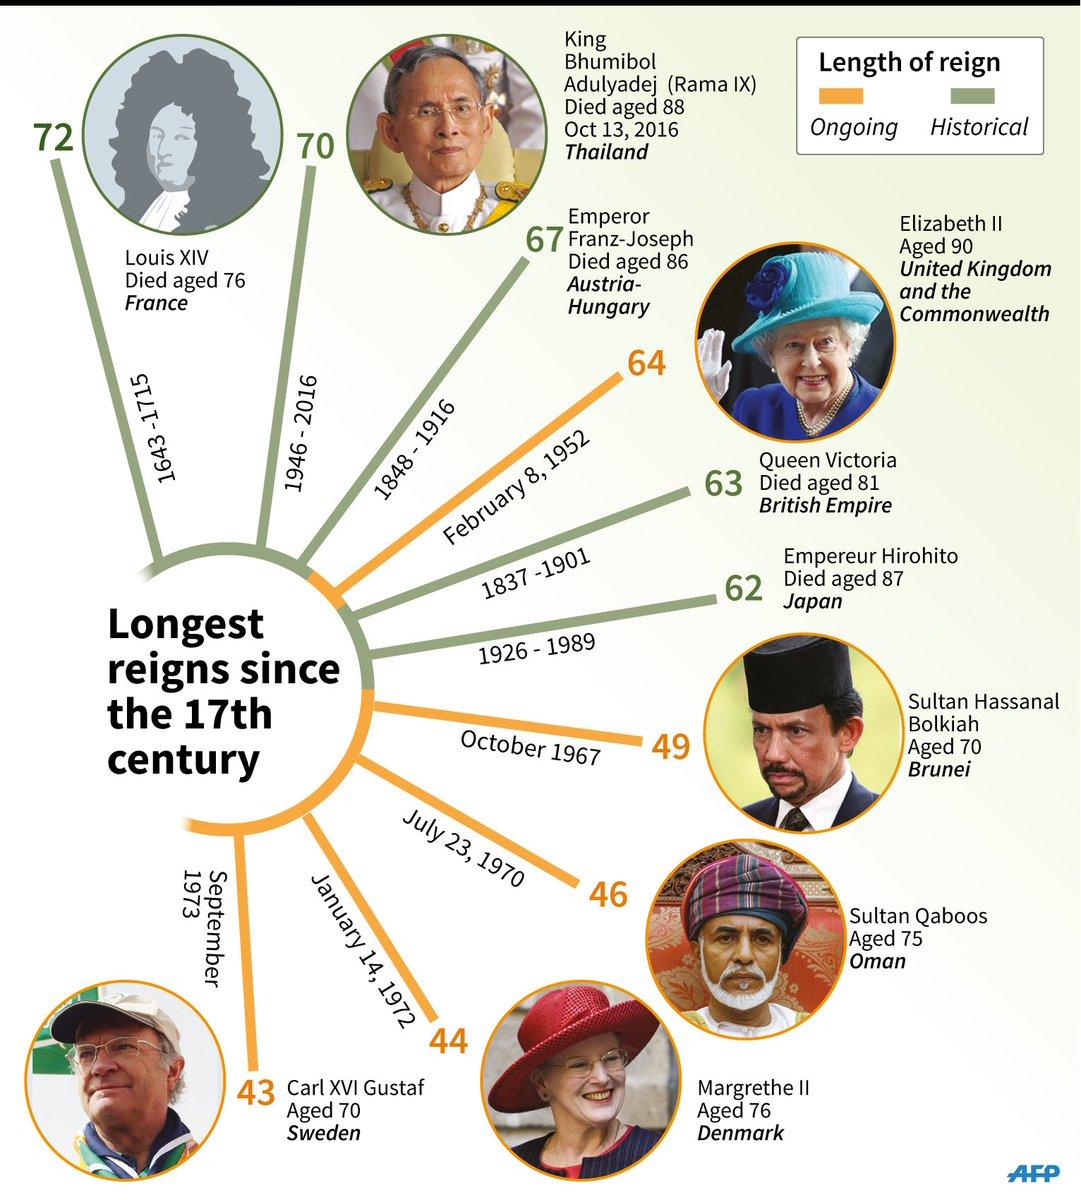 World's longest-reigning monarchs https://t.co/06iIwtBKeh https://t.co/Xeq8sXqa73